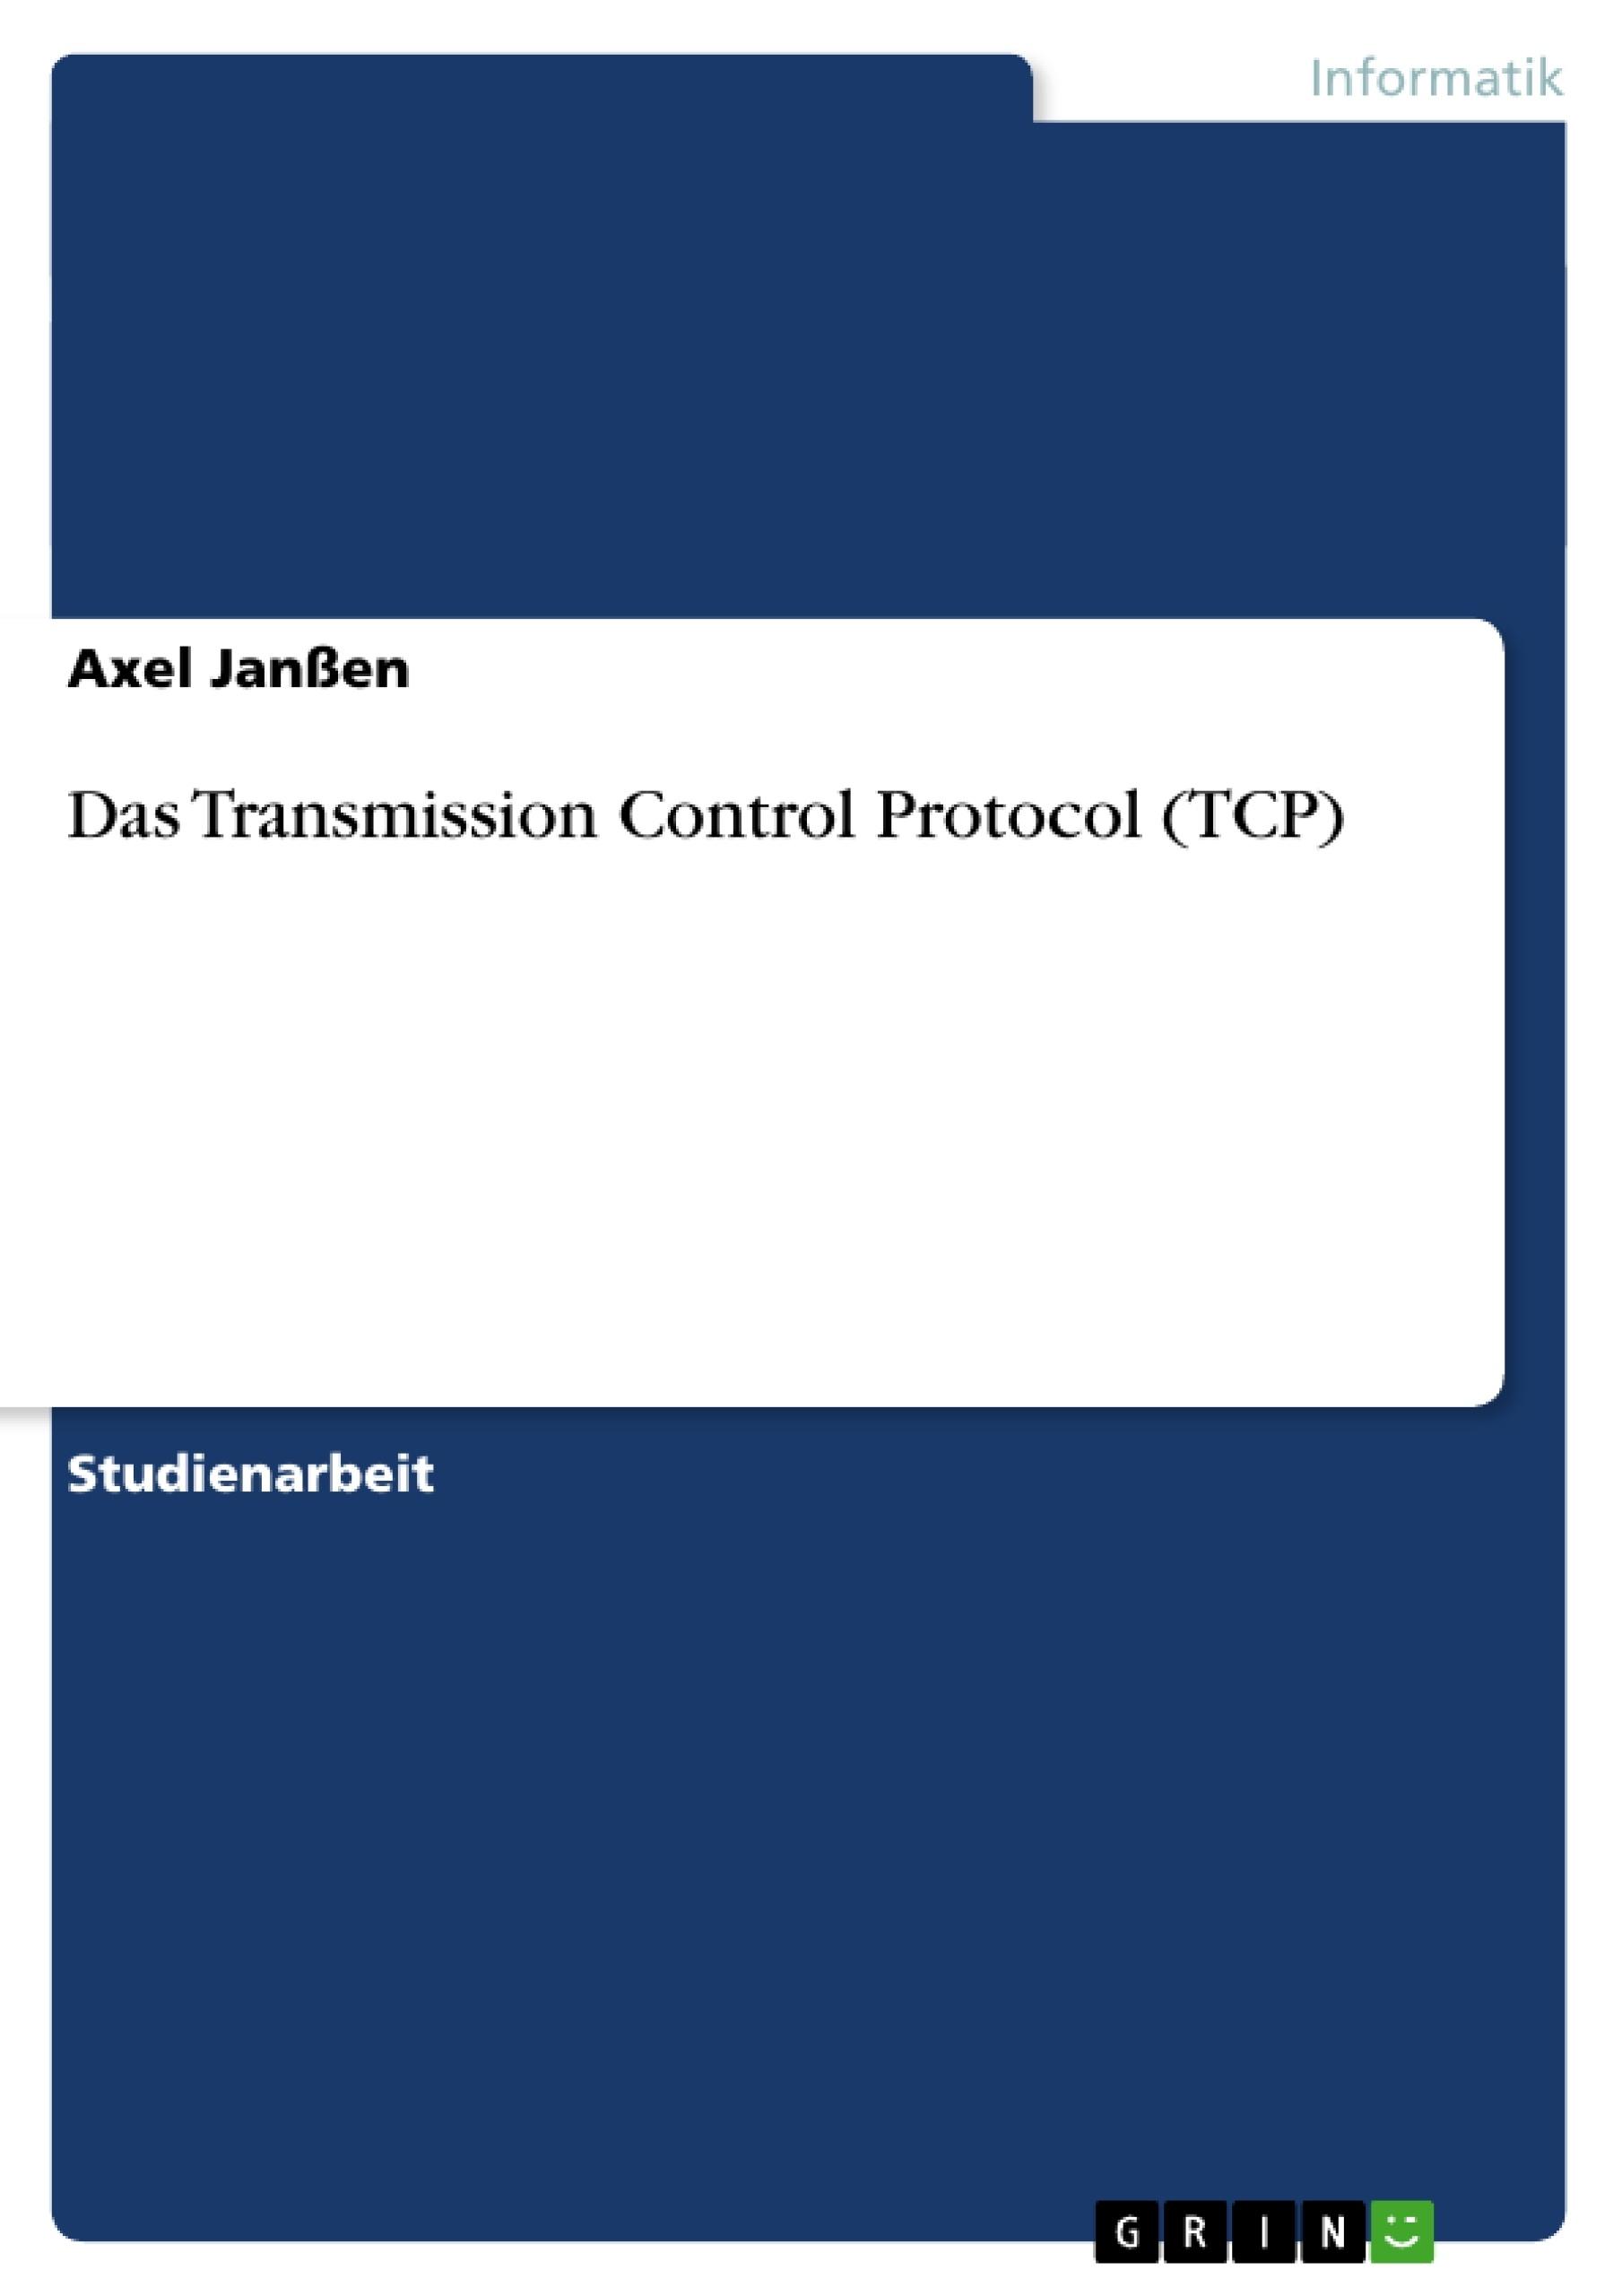 Titel: Das Transmission Control Protocol (TCP)